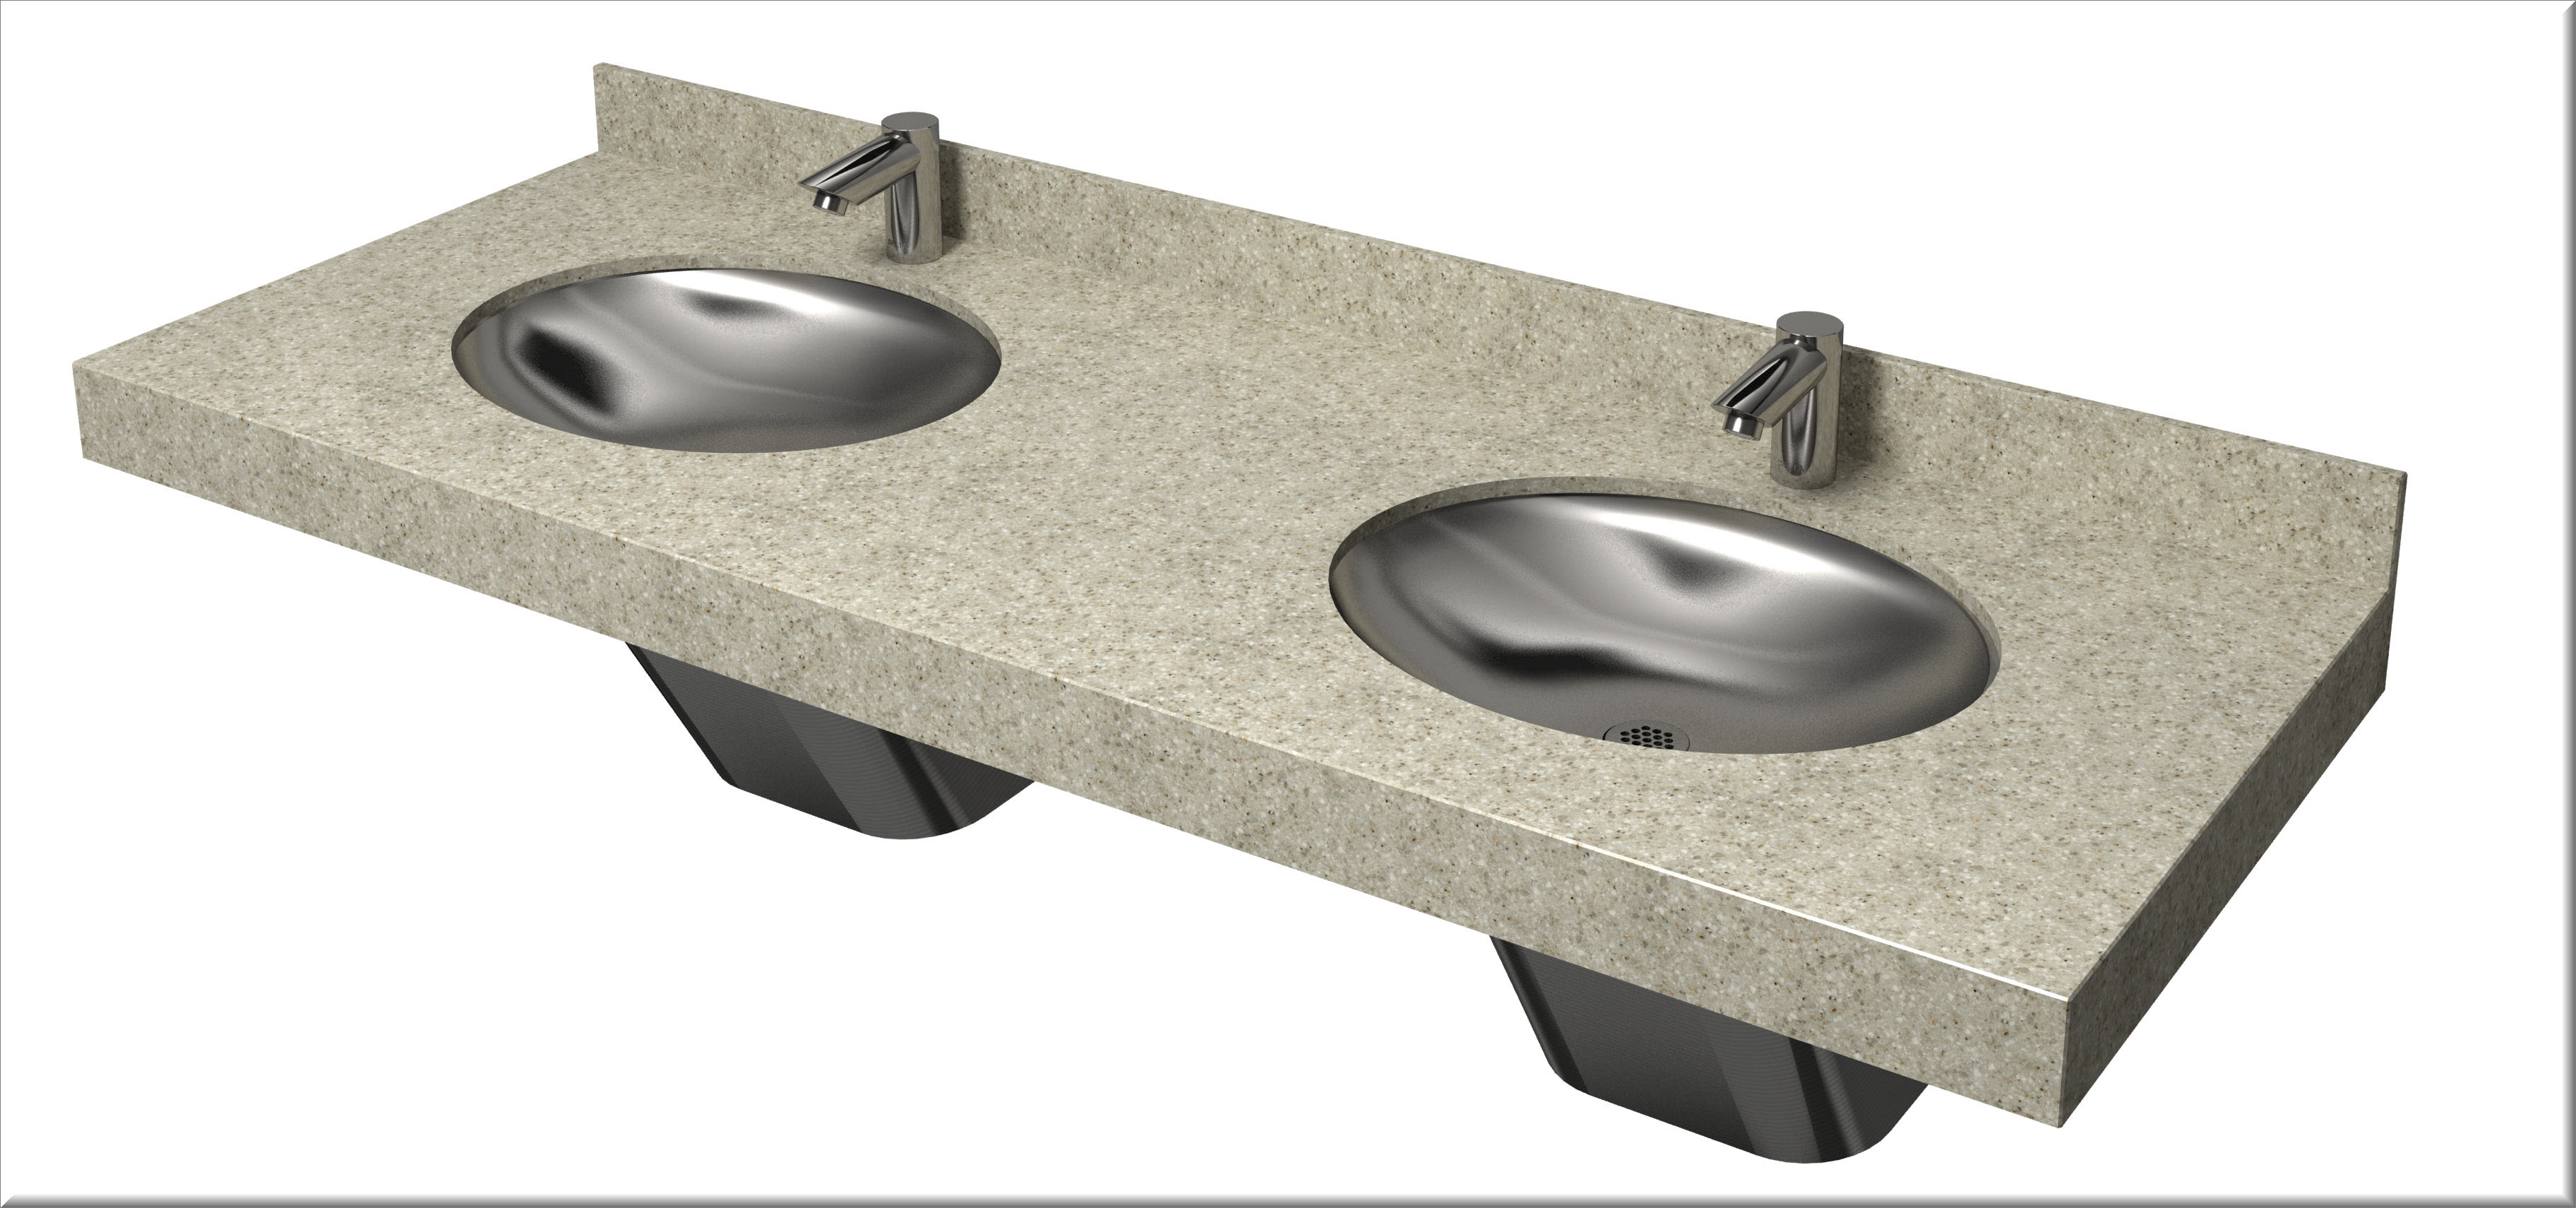 Bathroom Sinks Revit bradley bim-revit resource portal » bradley revit sink family